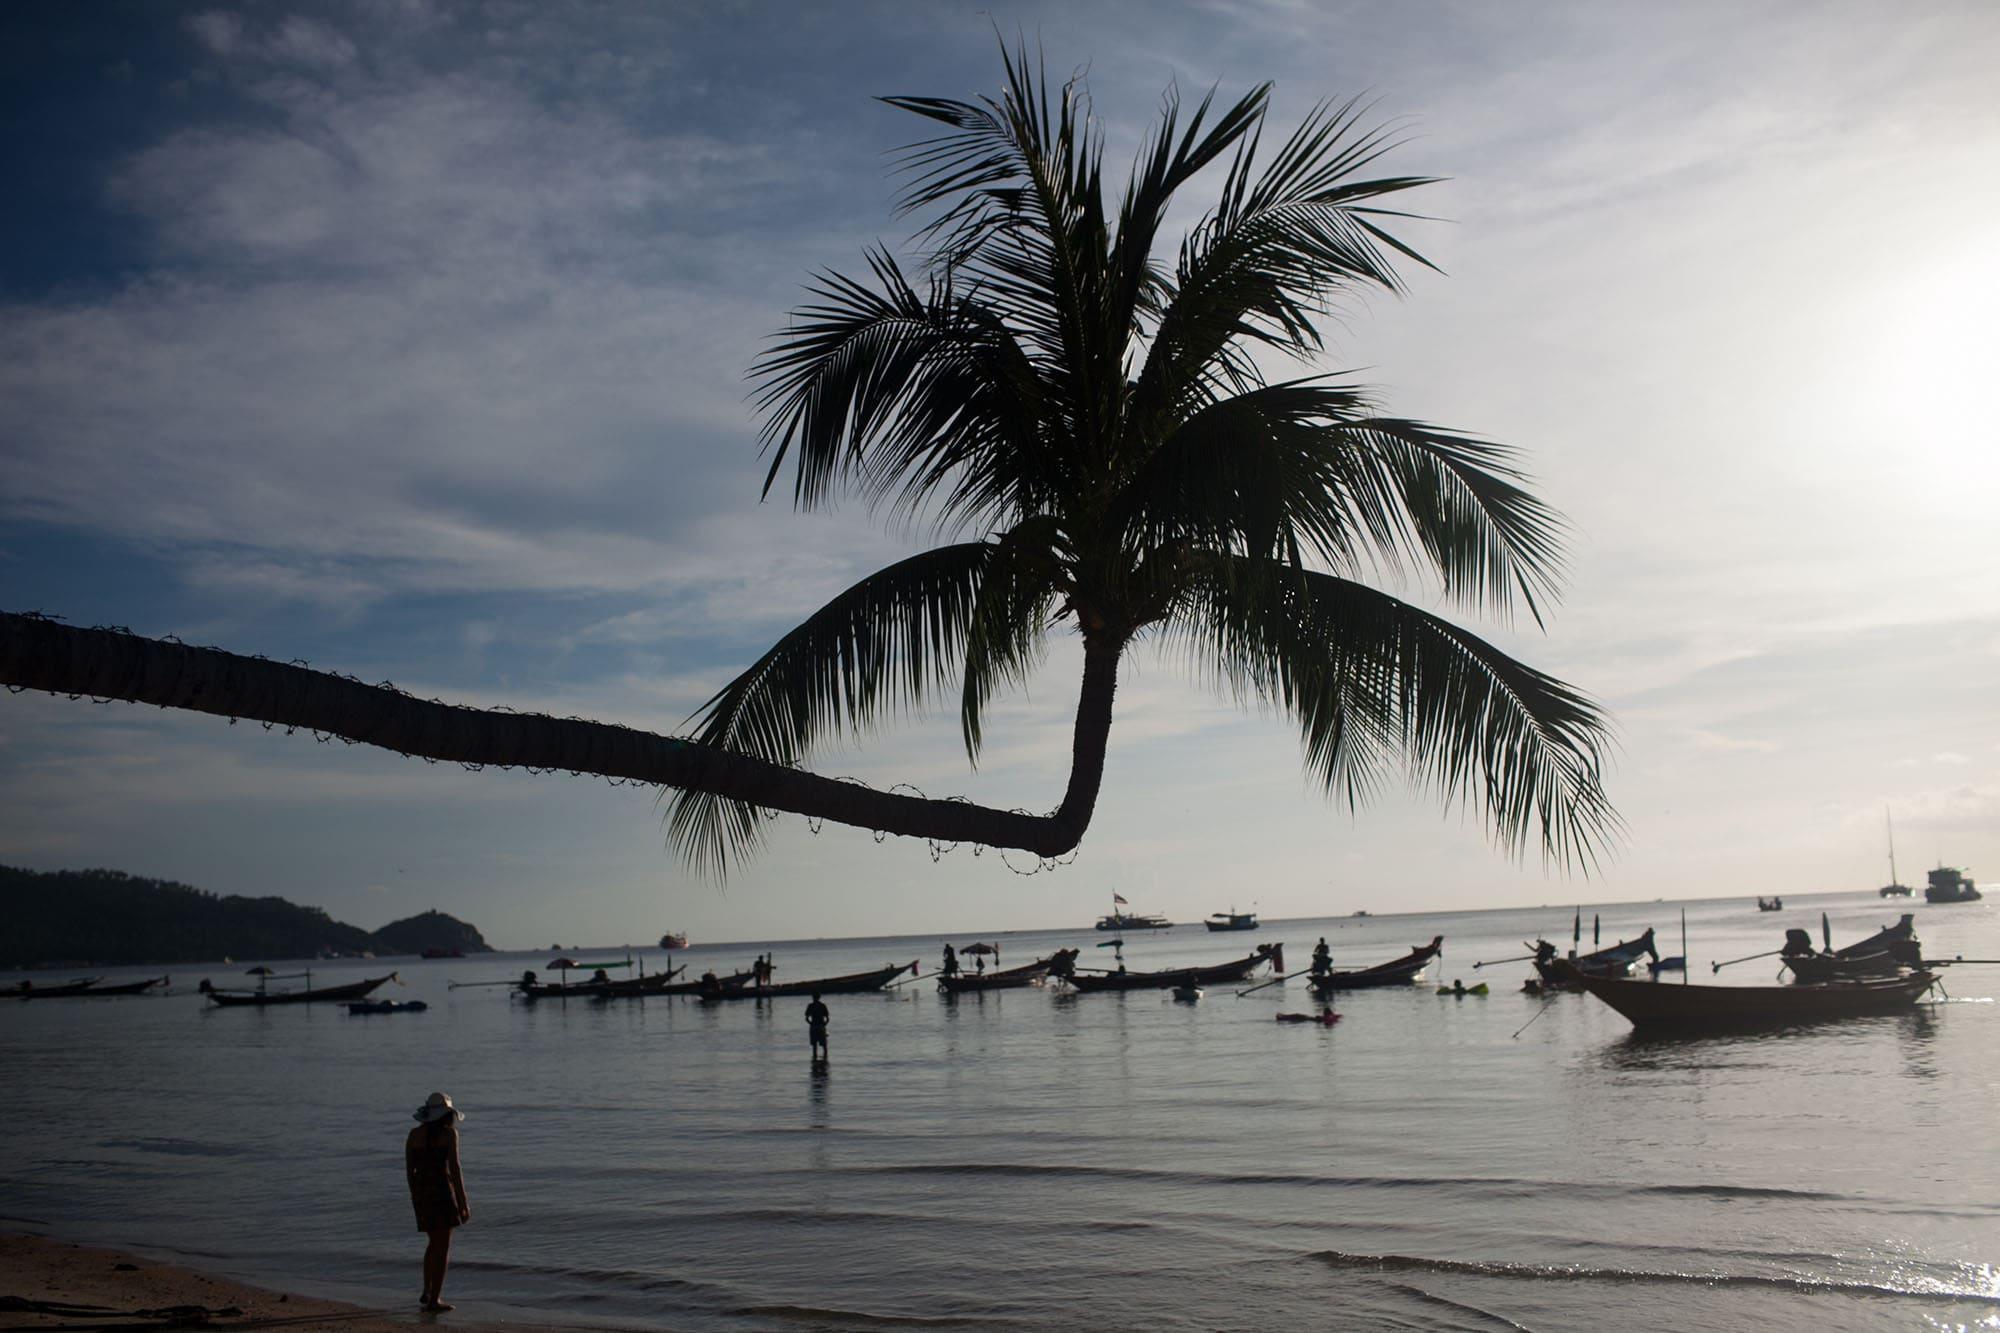 Beach in Koh Tao, Thailand